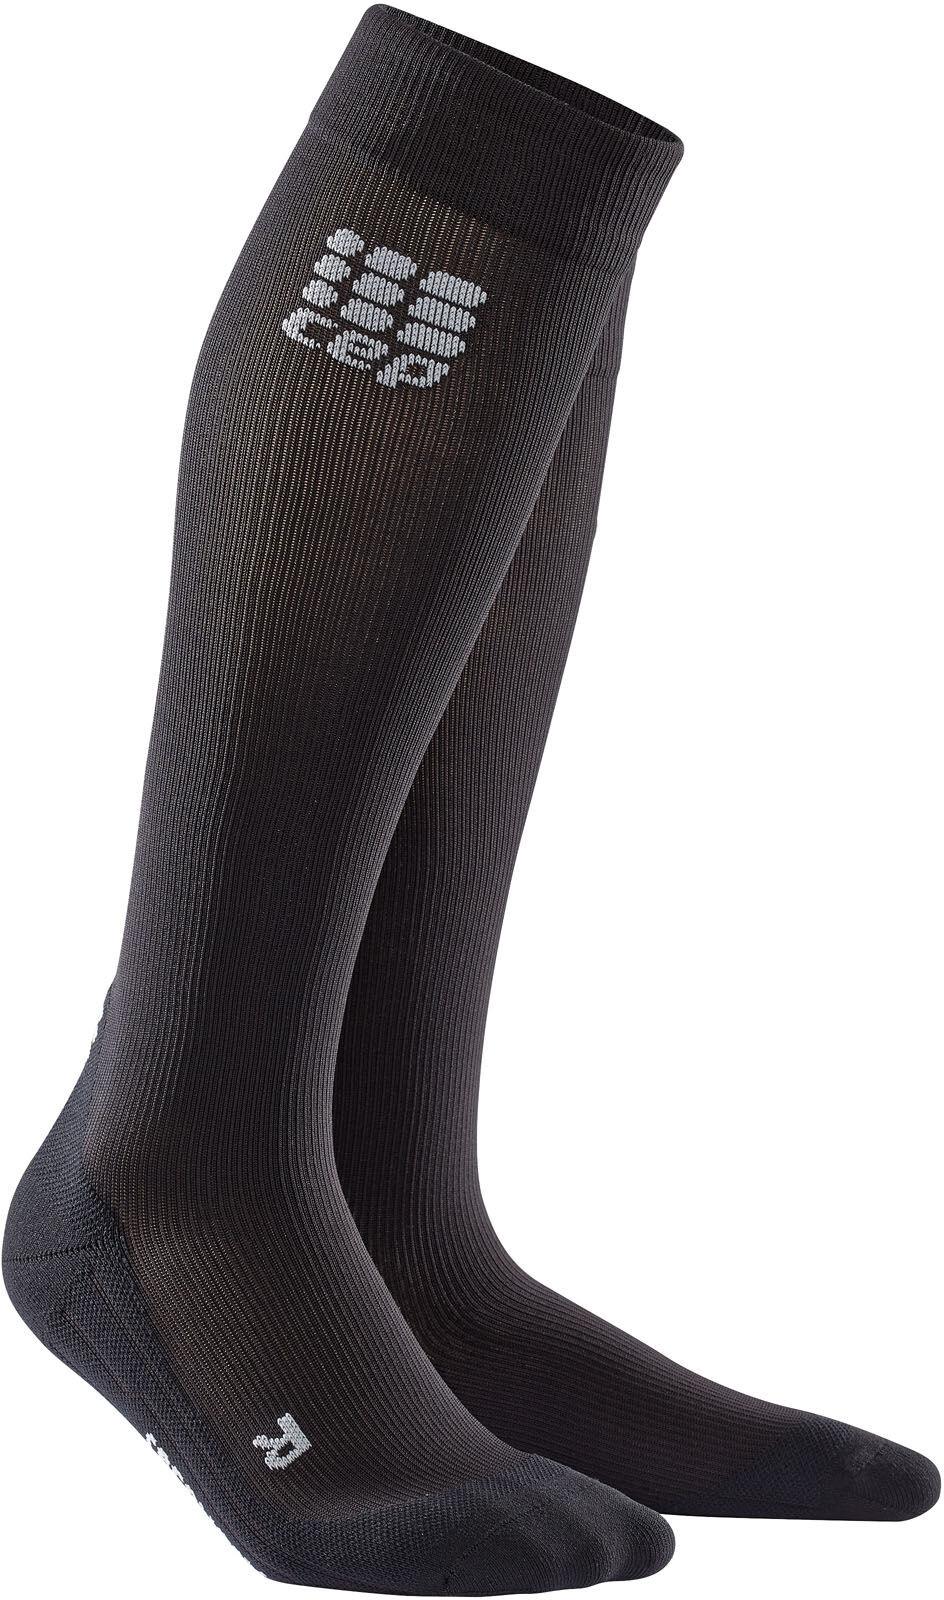 cep Recovery Socks Damer, black (2019) | Compression